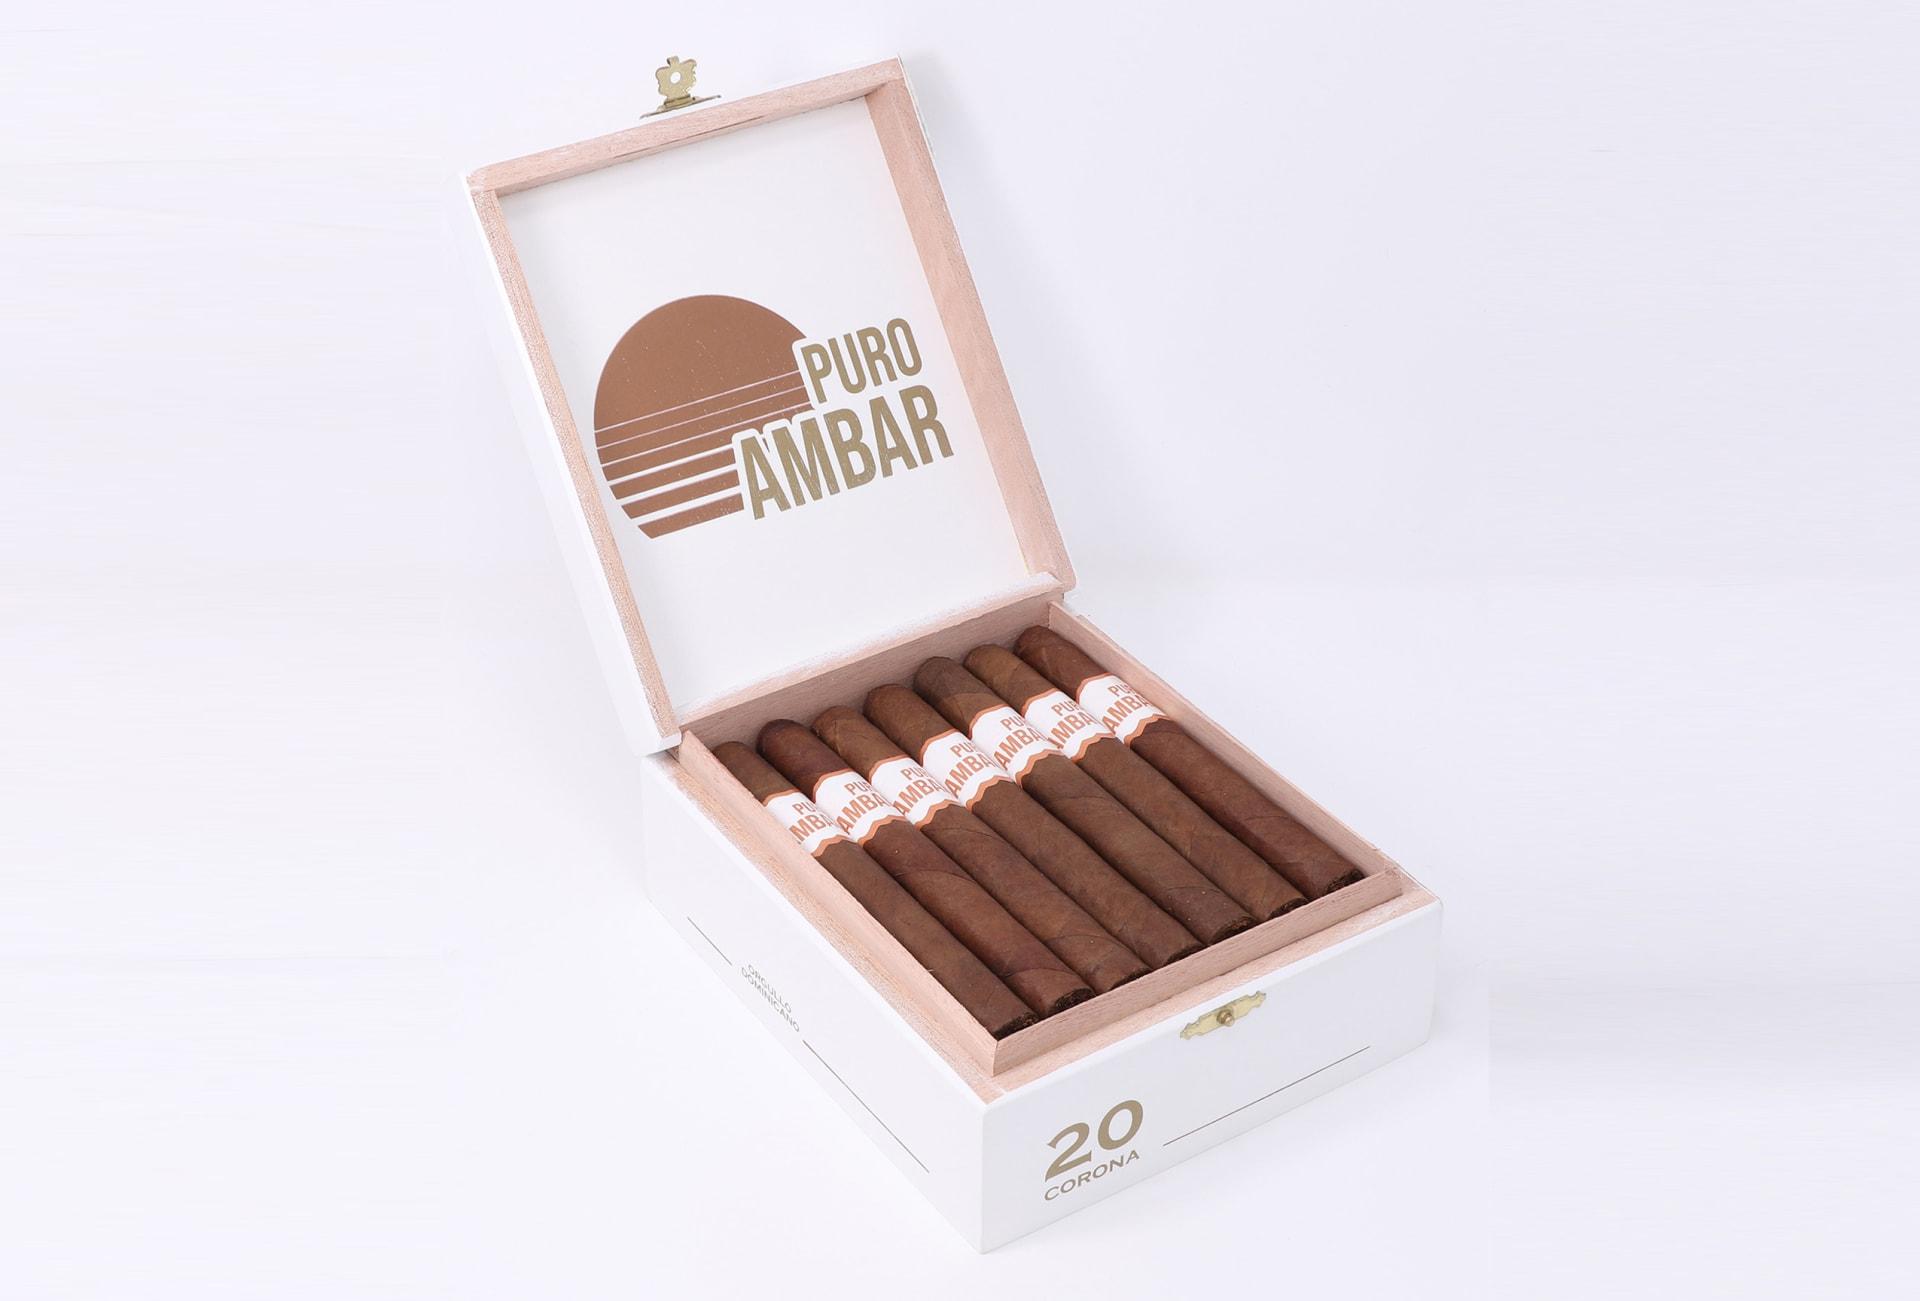 El Artista Cigars Revamps Puro Ambar Featured Image